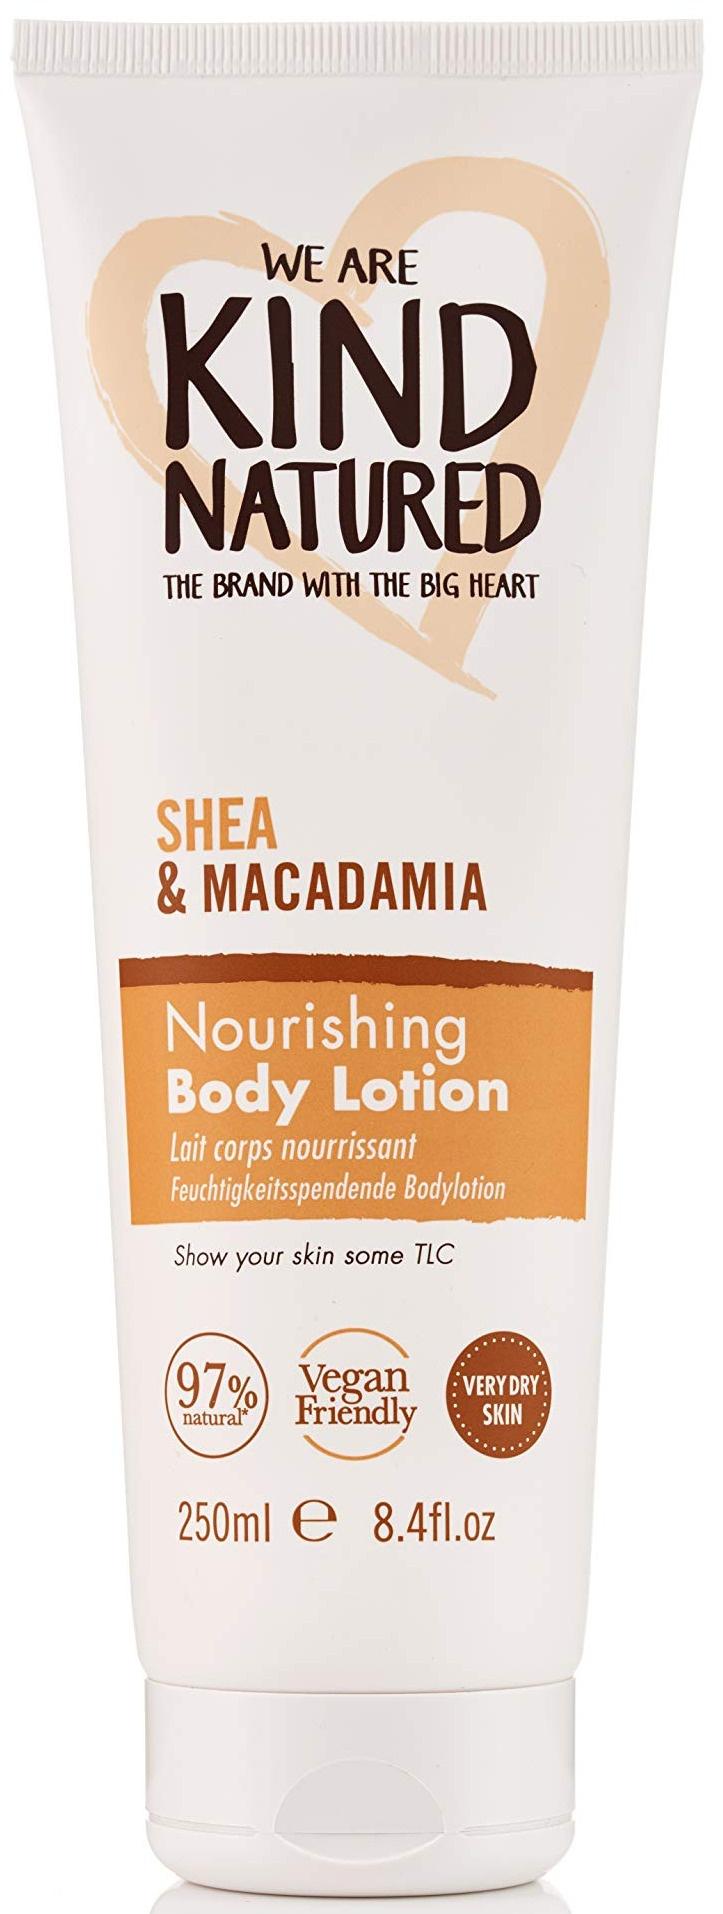 Kind Natured Shea And Macadamia Nourishing Body Lotion